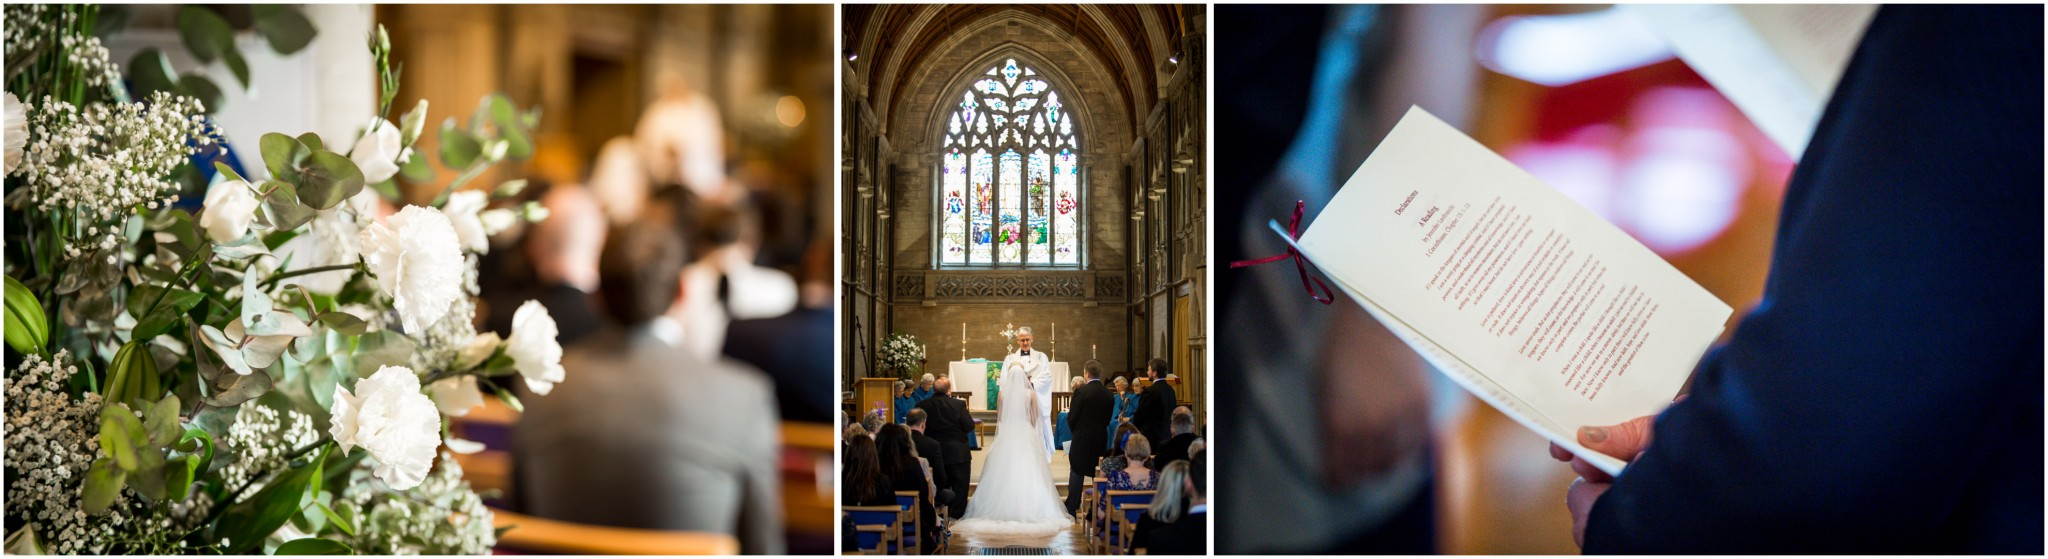 St Saviours Church Brockenhurst Wedding Flowers